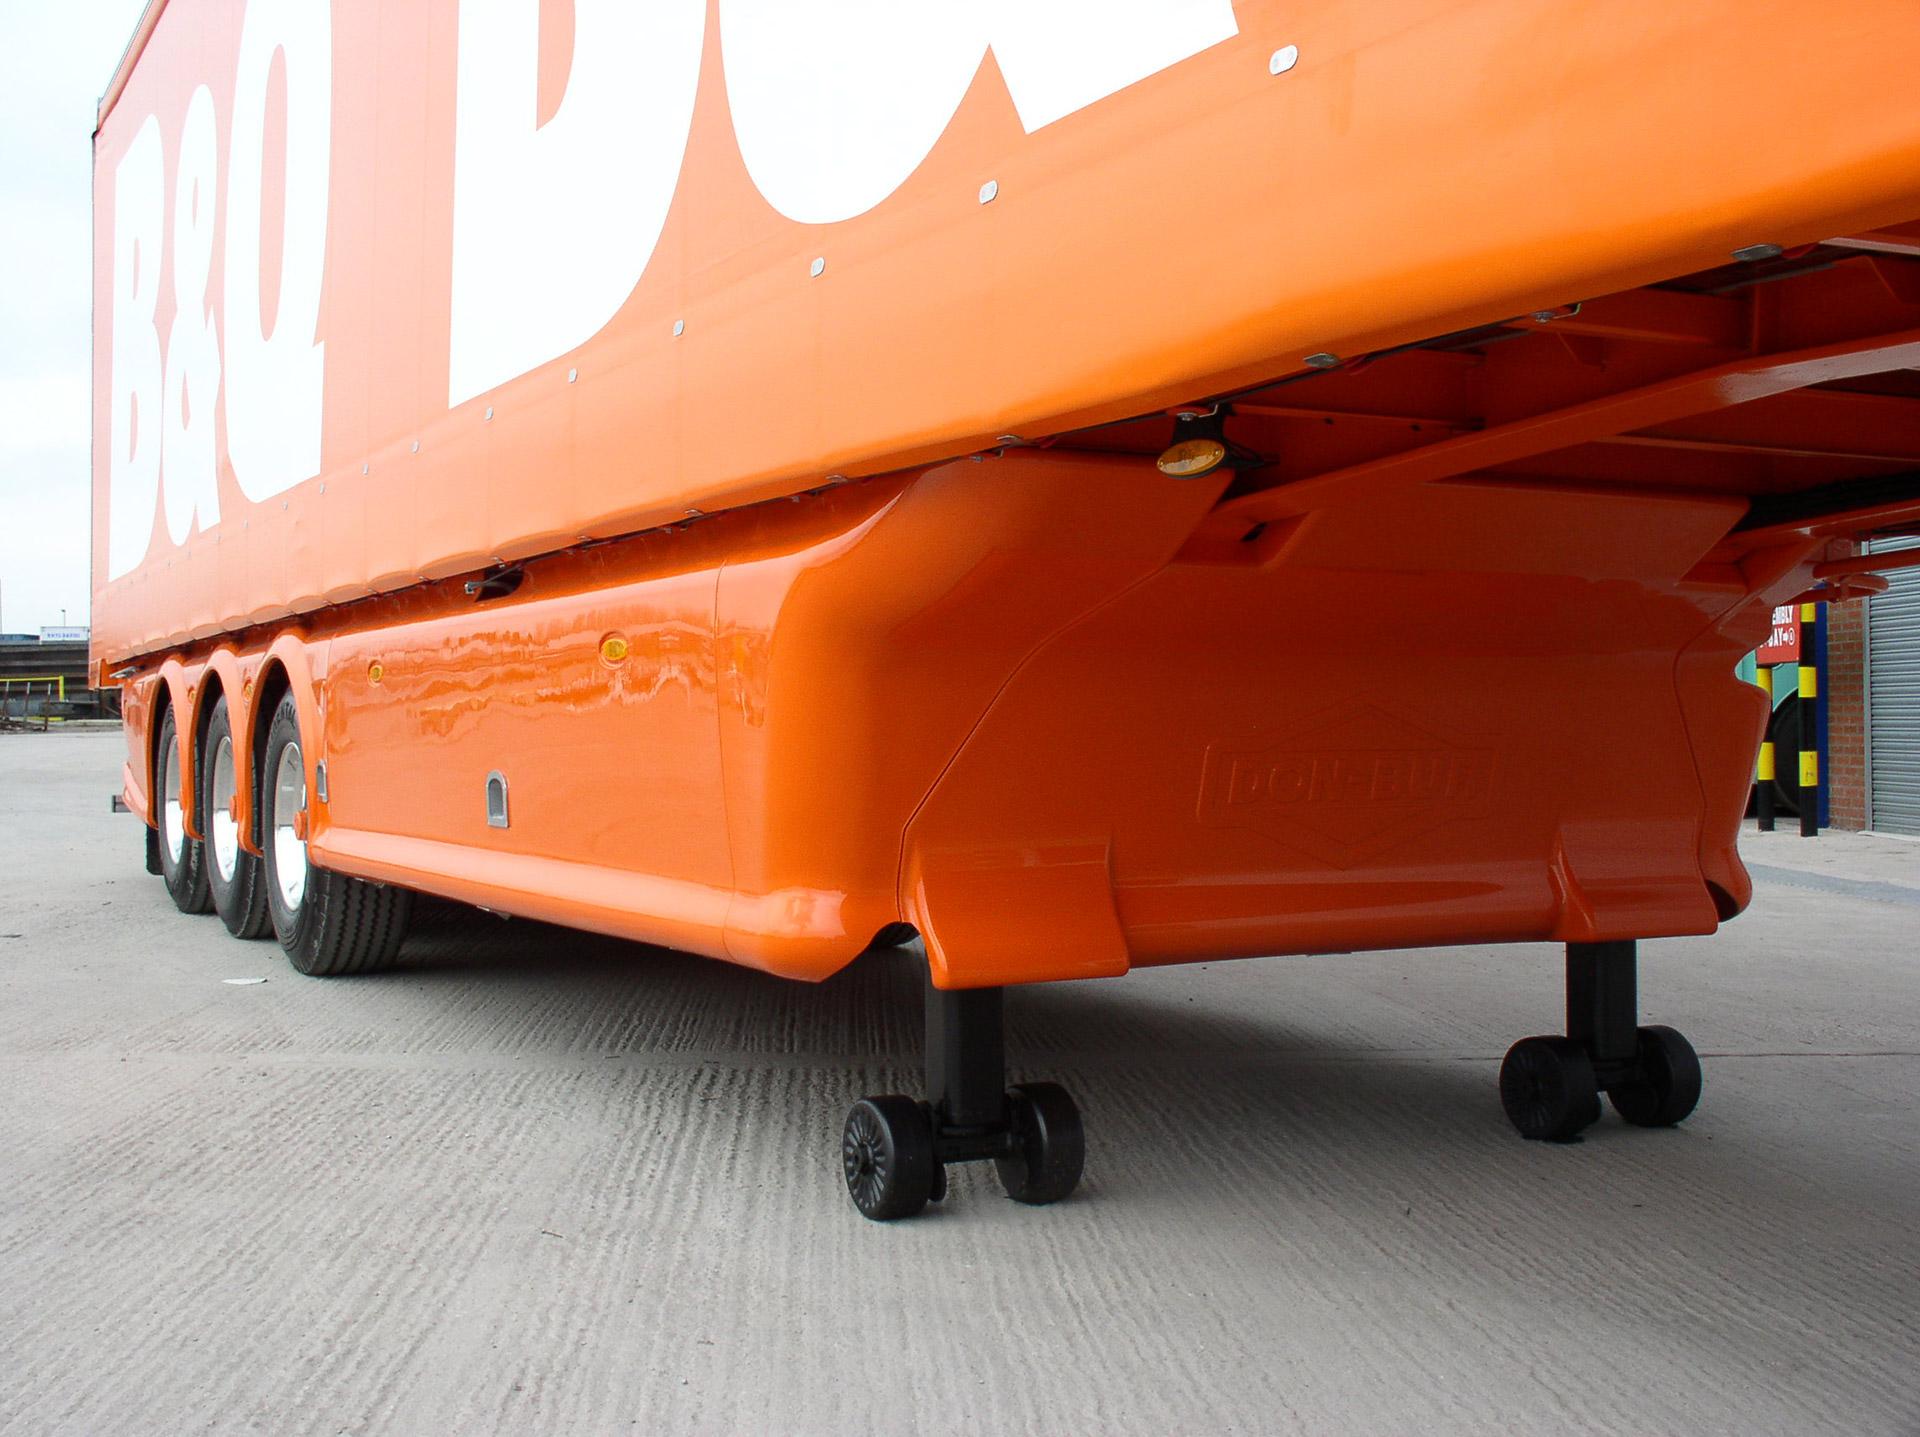 Full Wrap Aerodynamic Trailer Skirts